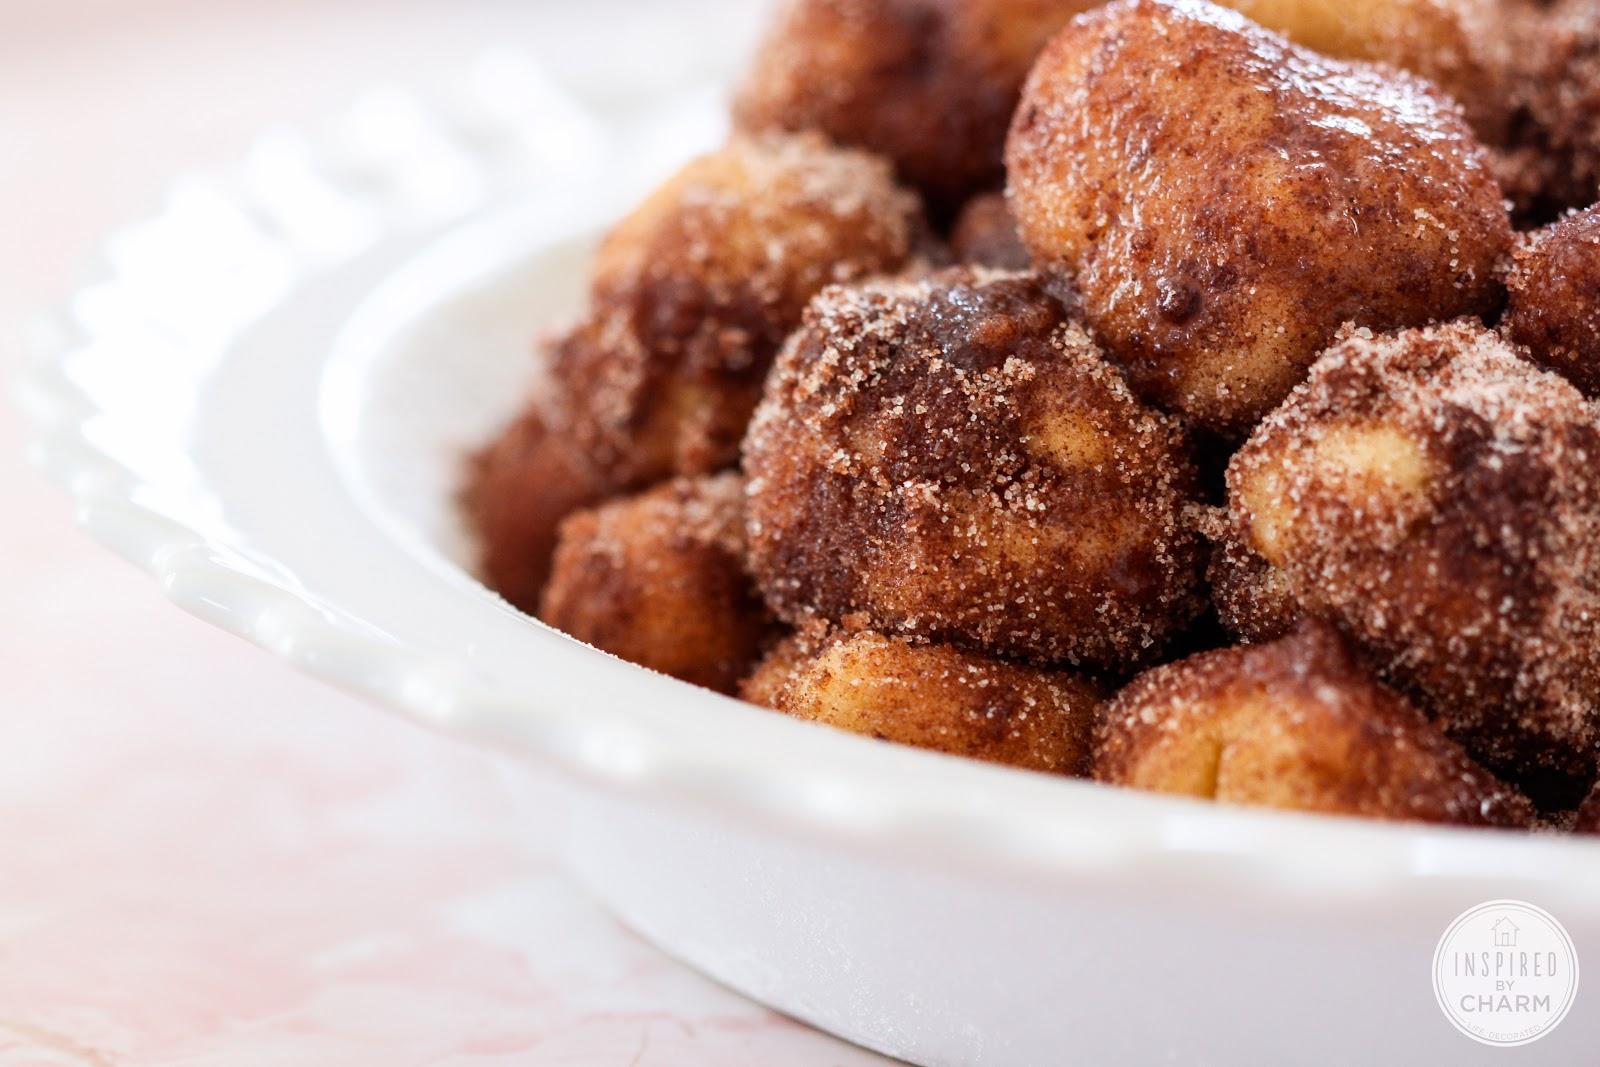 Cinnamon Bun Bites - Inspired by Charm